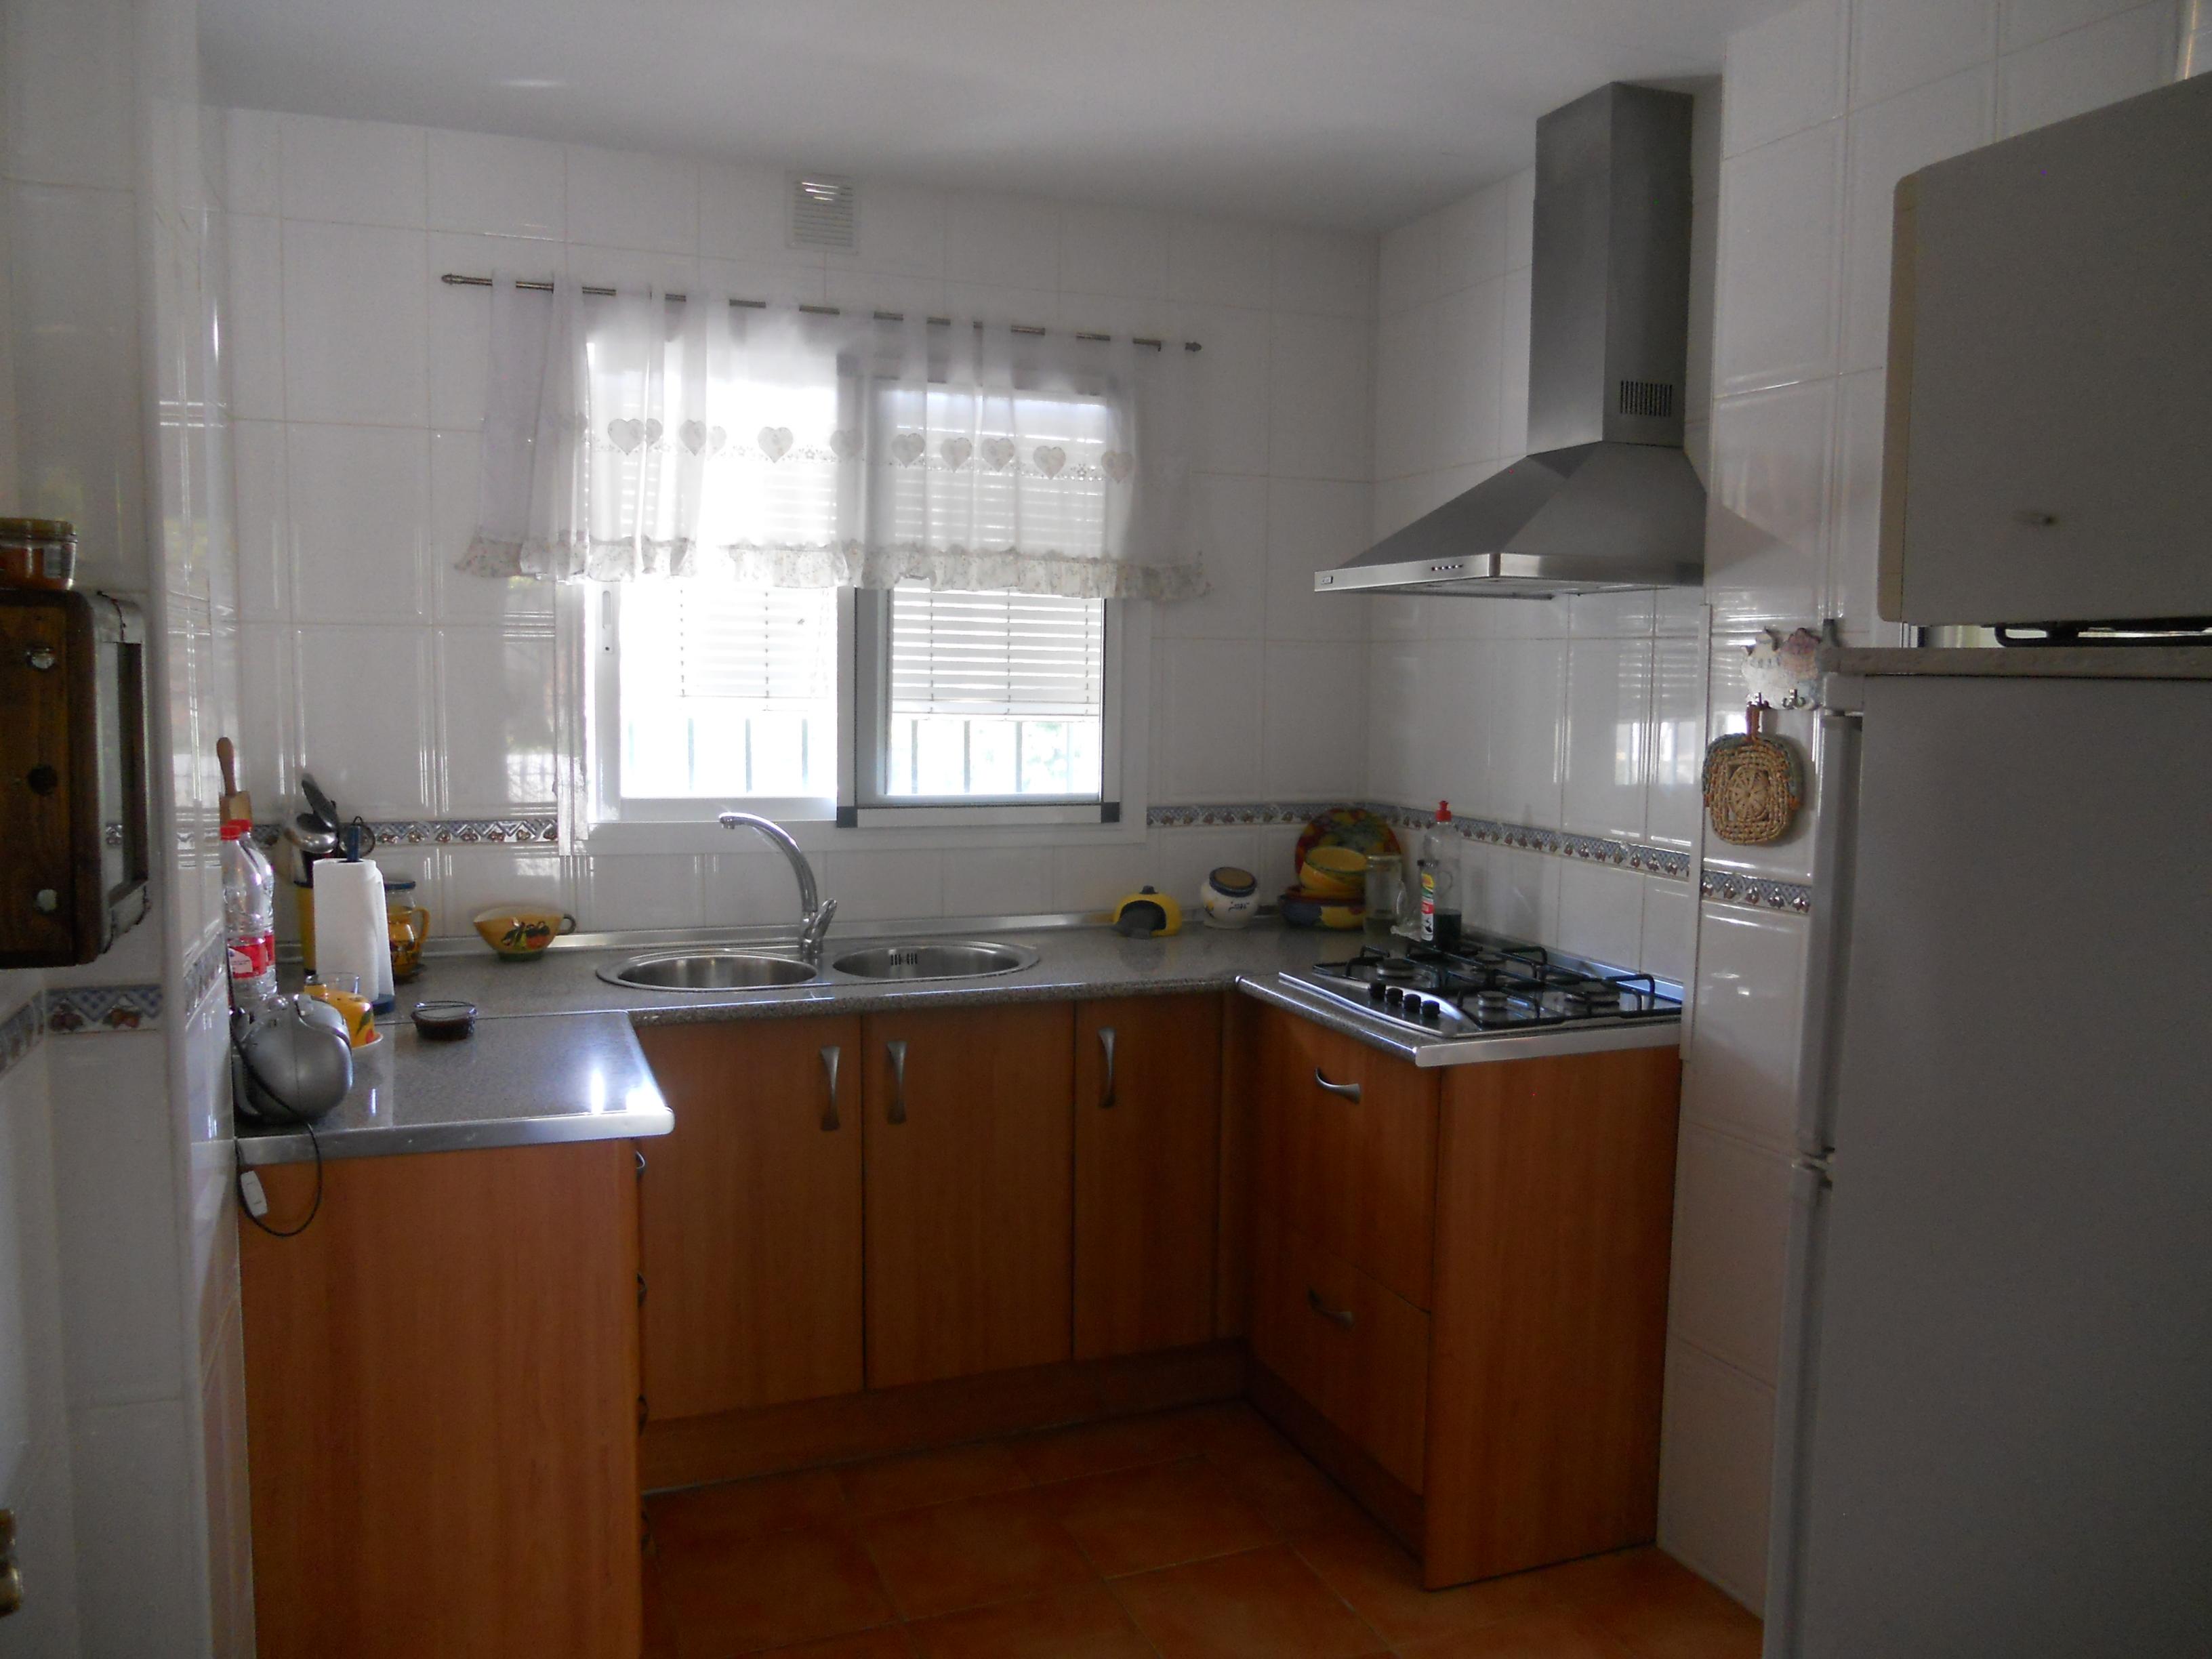 macharaviaya casa en venta ref 9057 asesor a mj